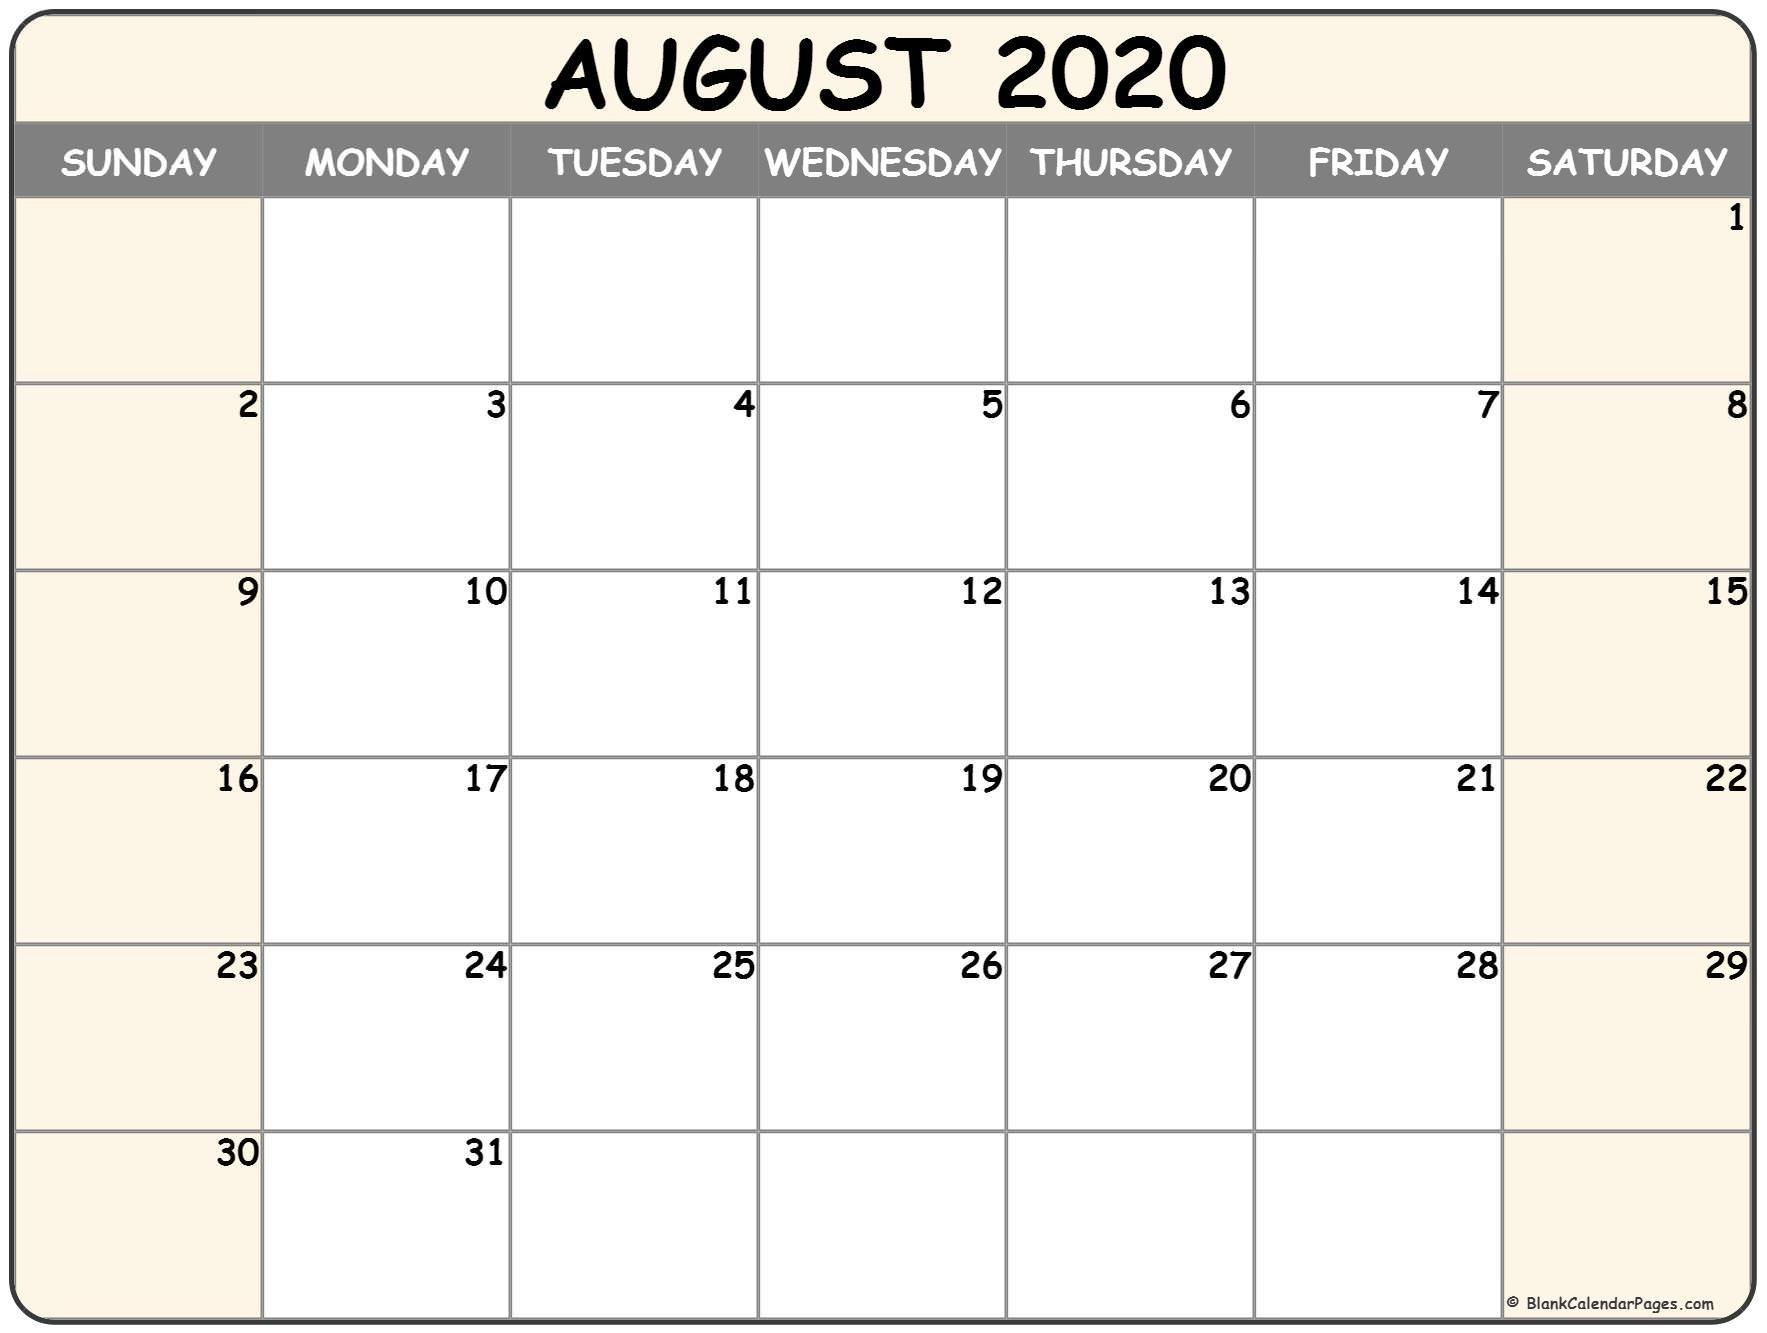 August 2020 Calendar | Free Printable Monthly Calendars Free Blank Calendar Page